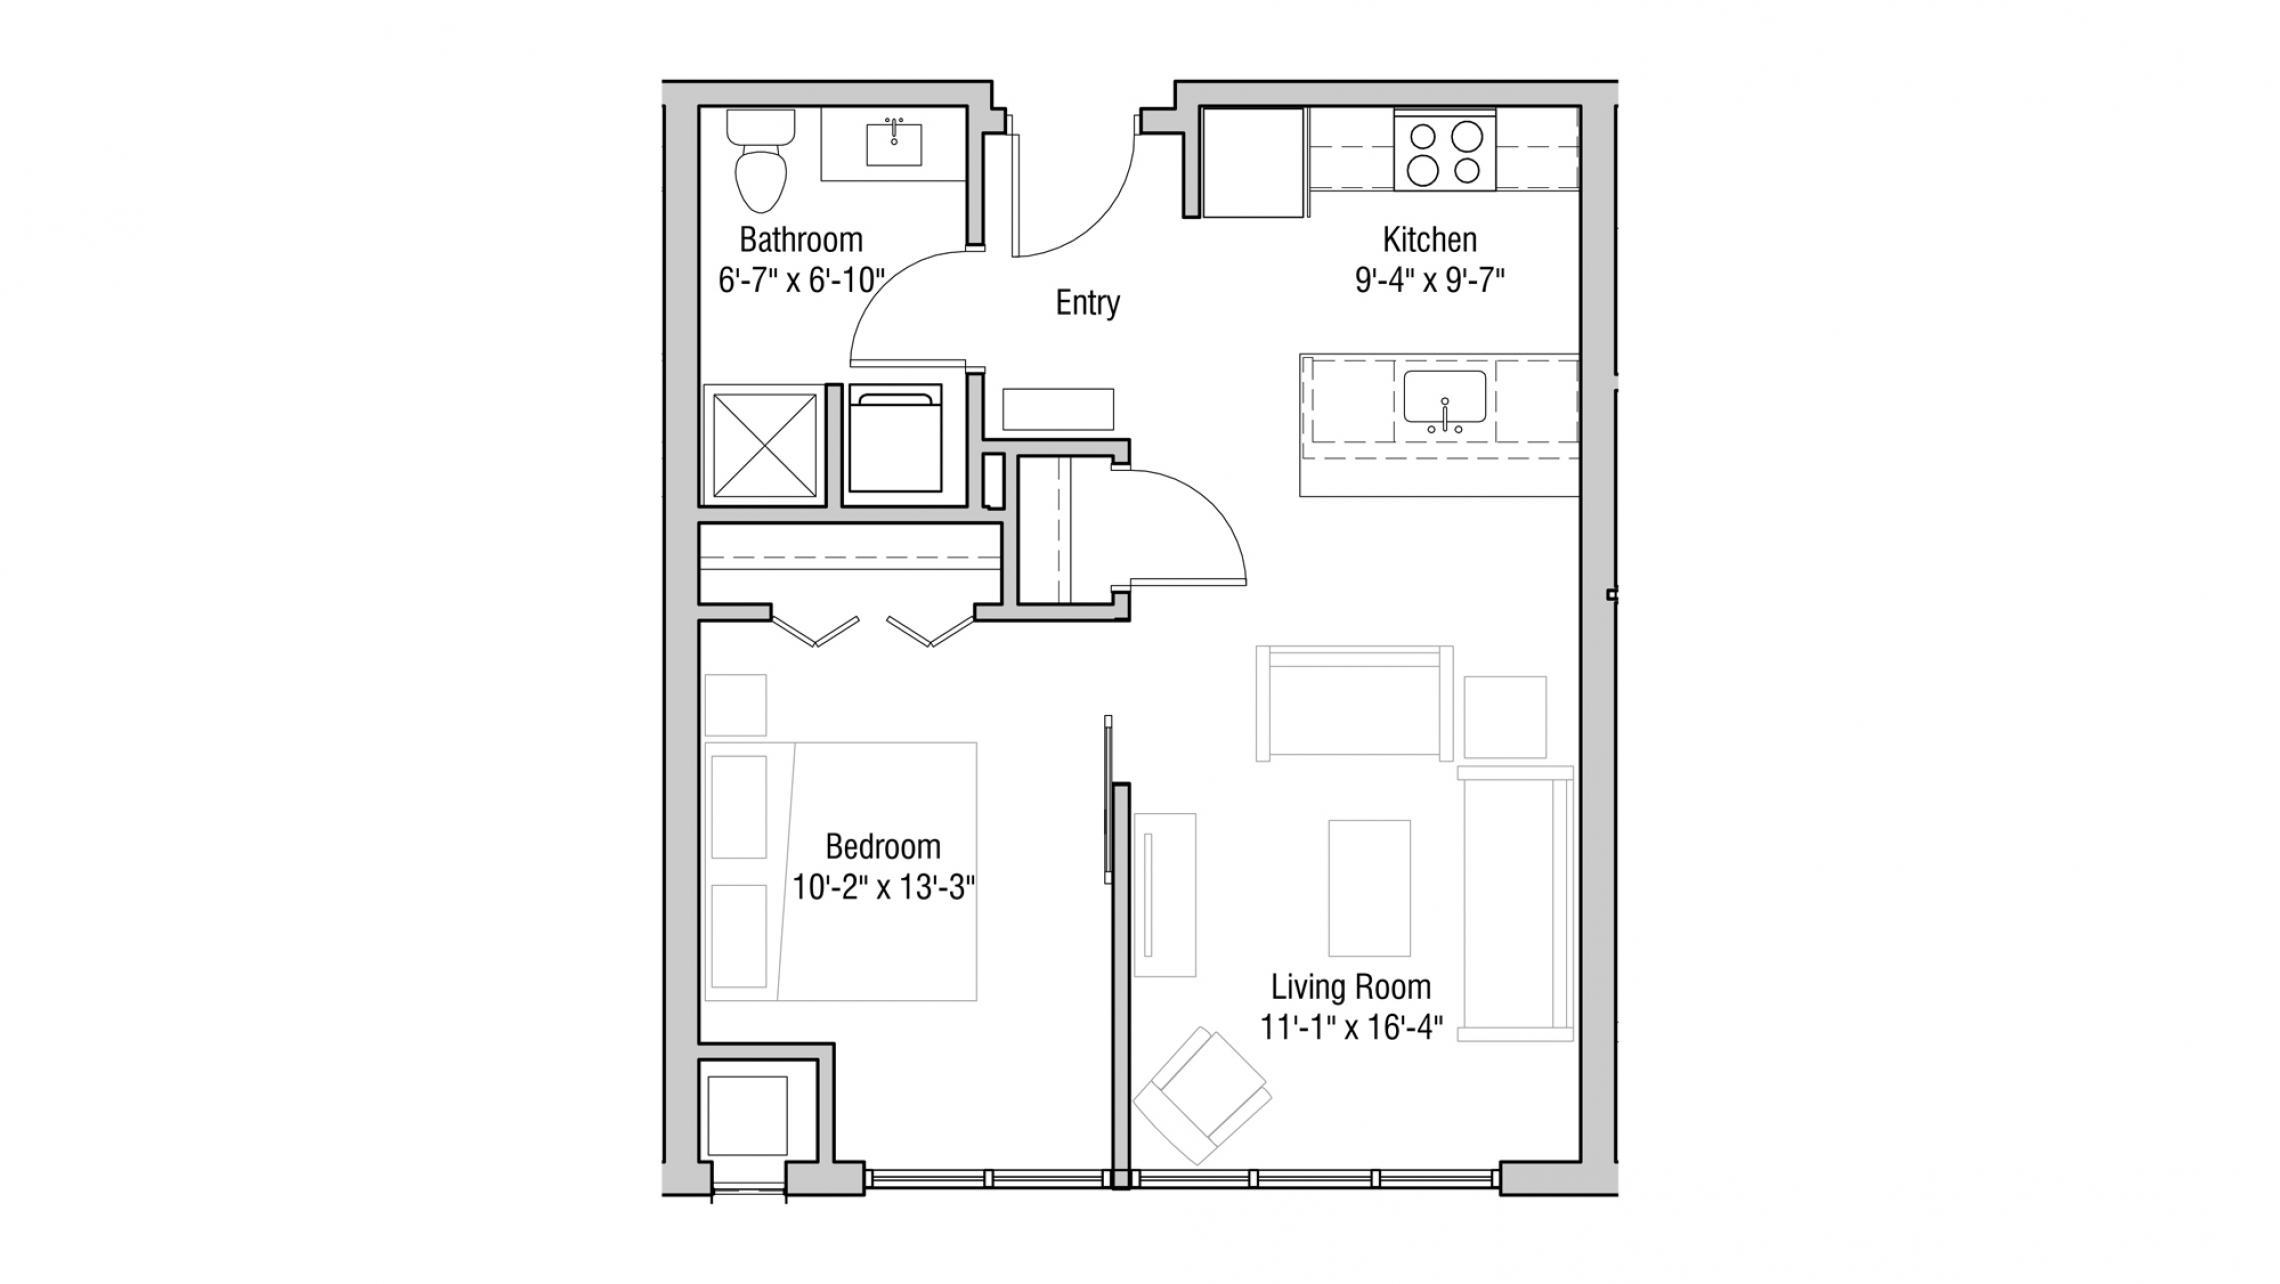 ULI Quarter Row 305 - One Bedroom, One Bathroom